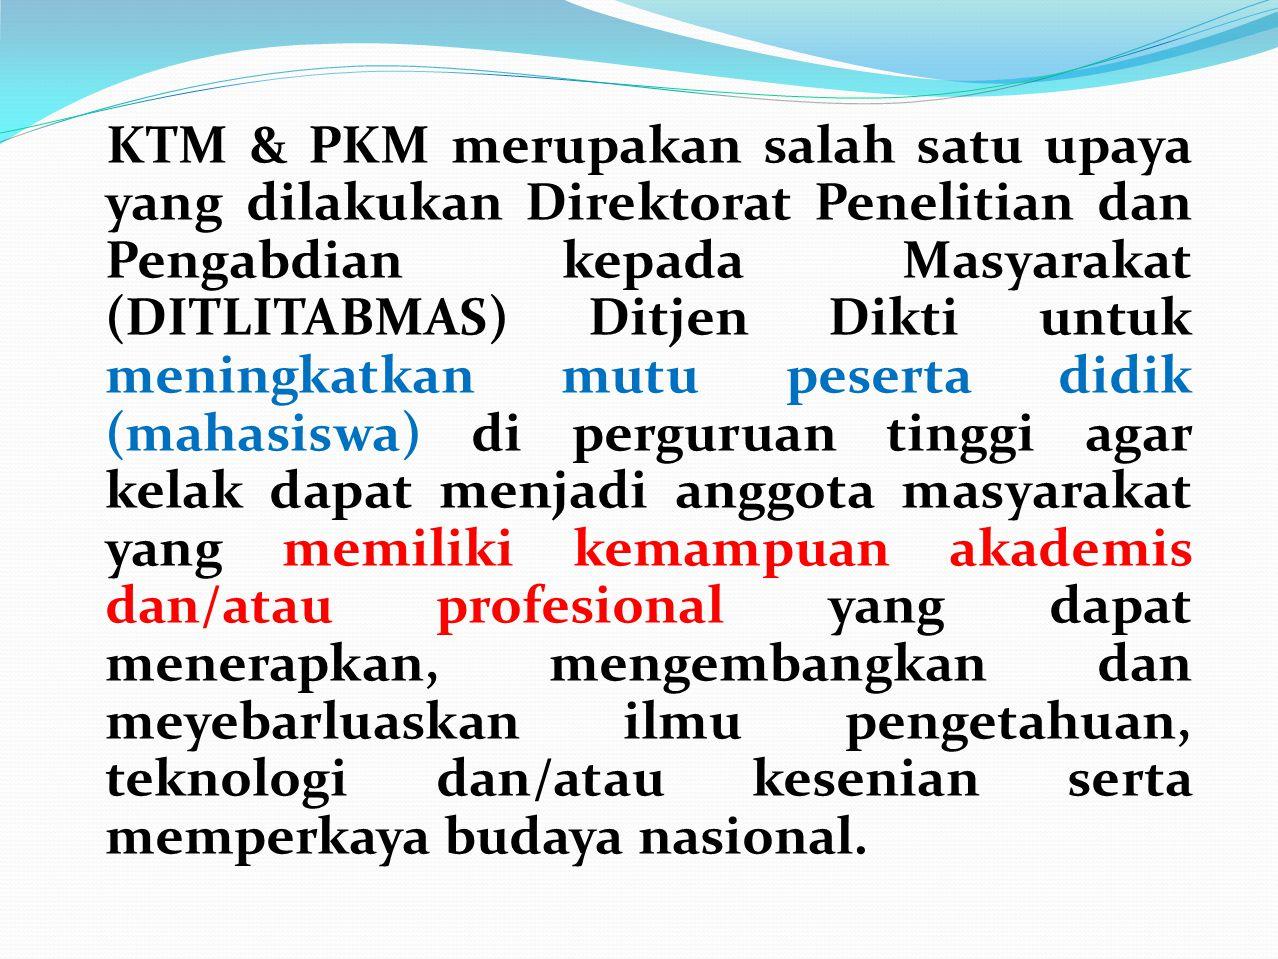 KTM & PKM merupakan salah satu upaya yang dilakukan Direktorat Penelitian dan Pengabdian kepada Masyarakat (DITLITABMAS) Ditjen Dikti untuk meningkatk